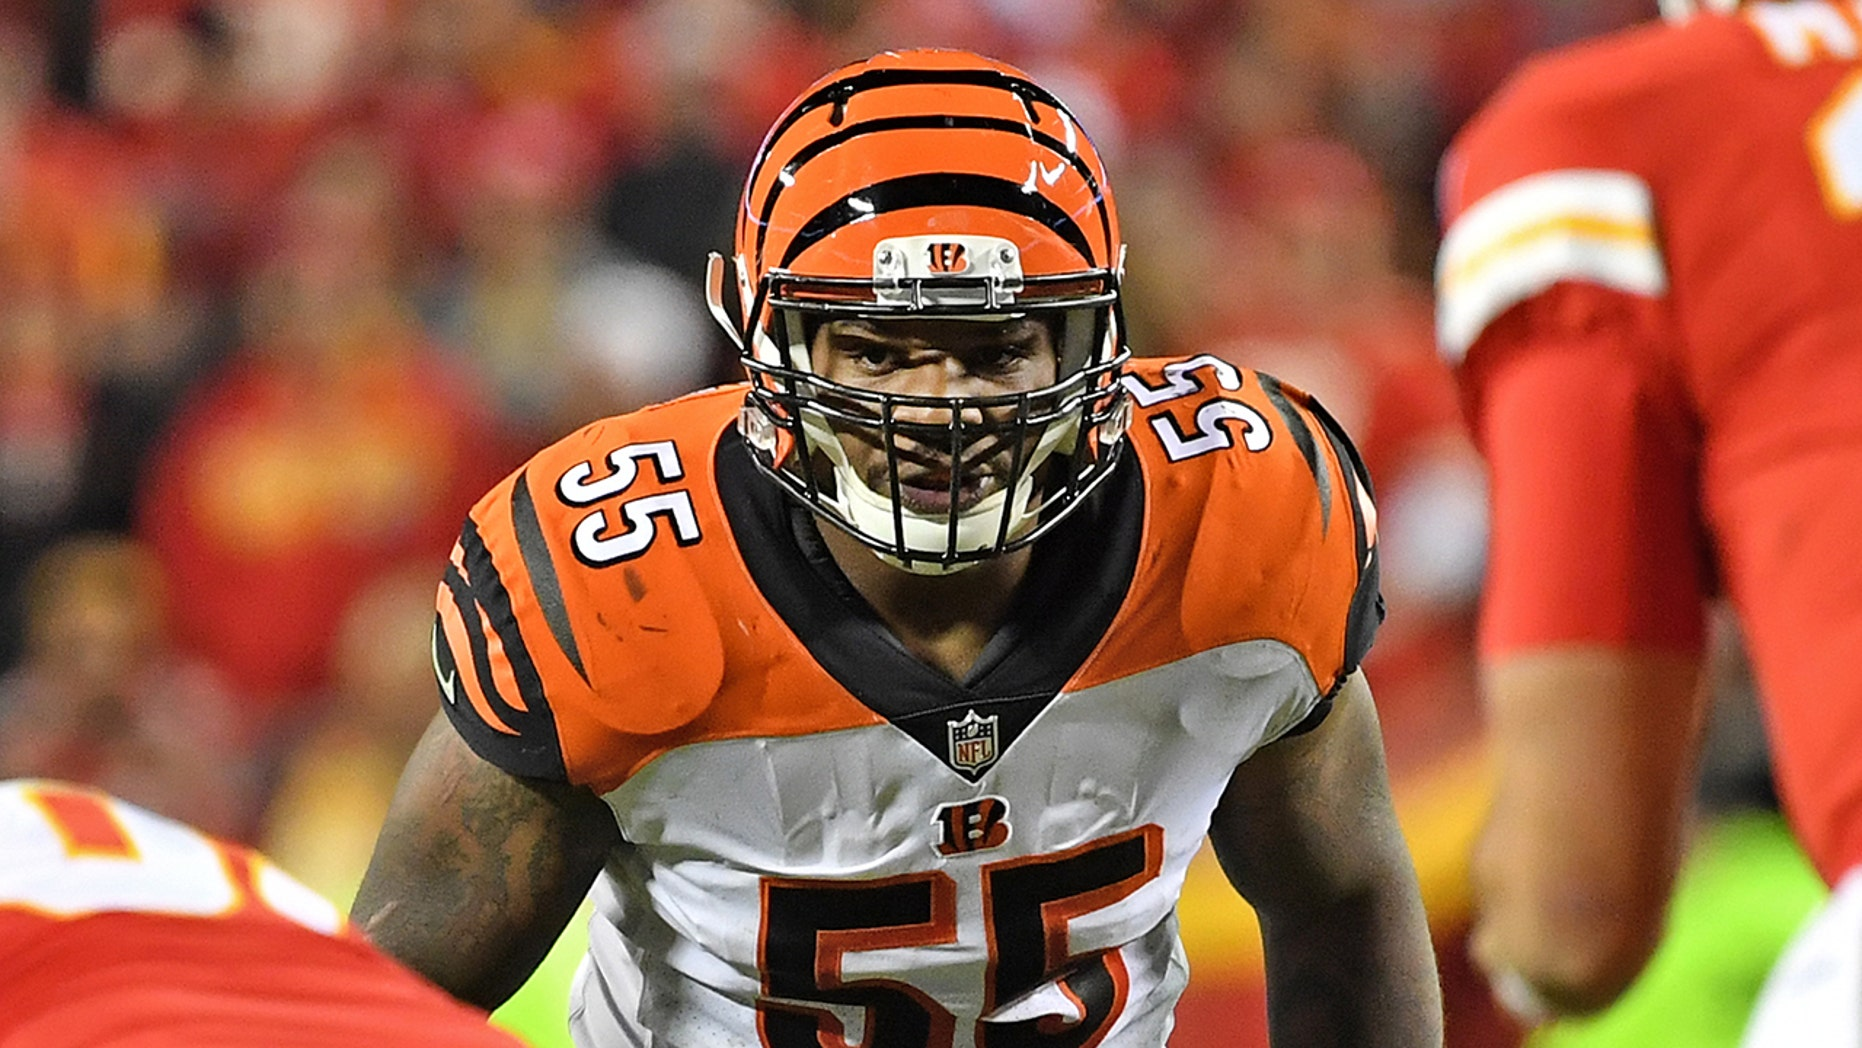 Linebacker Vontaze Burfict #55 of the Cincinnati Bengals may be finished.